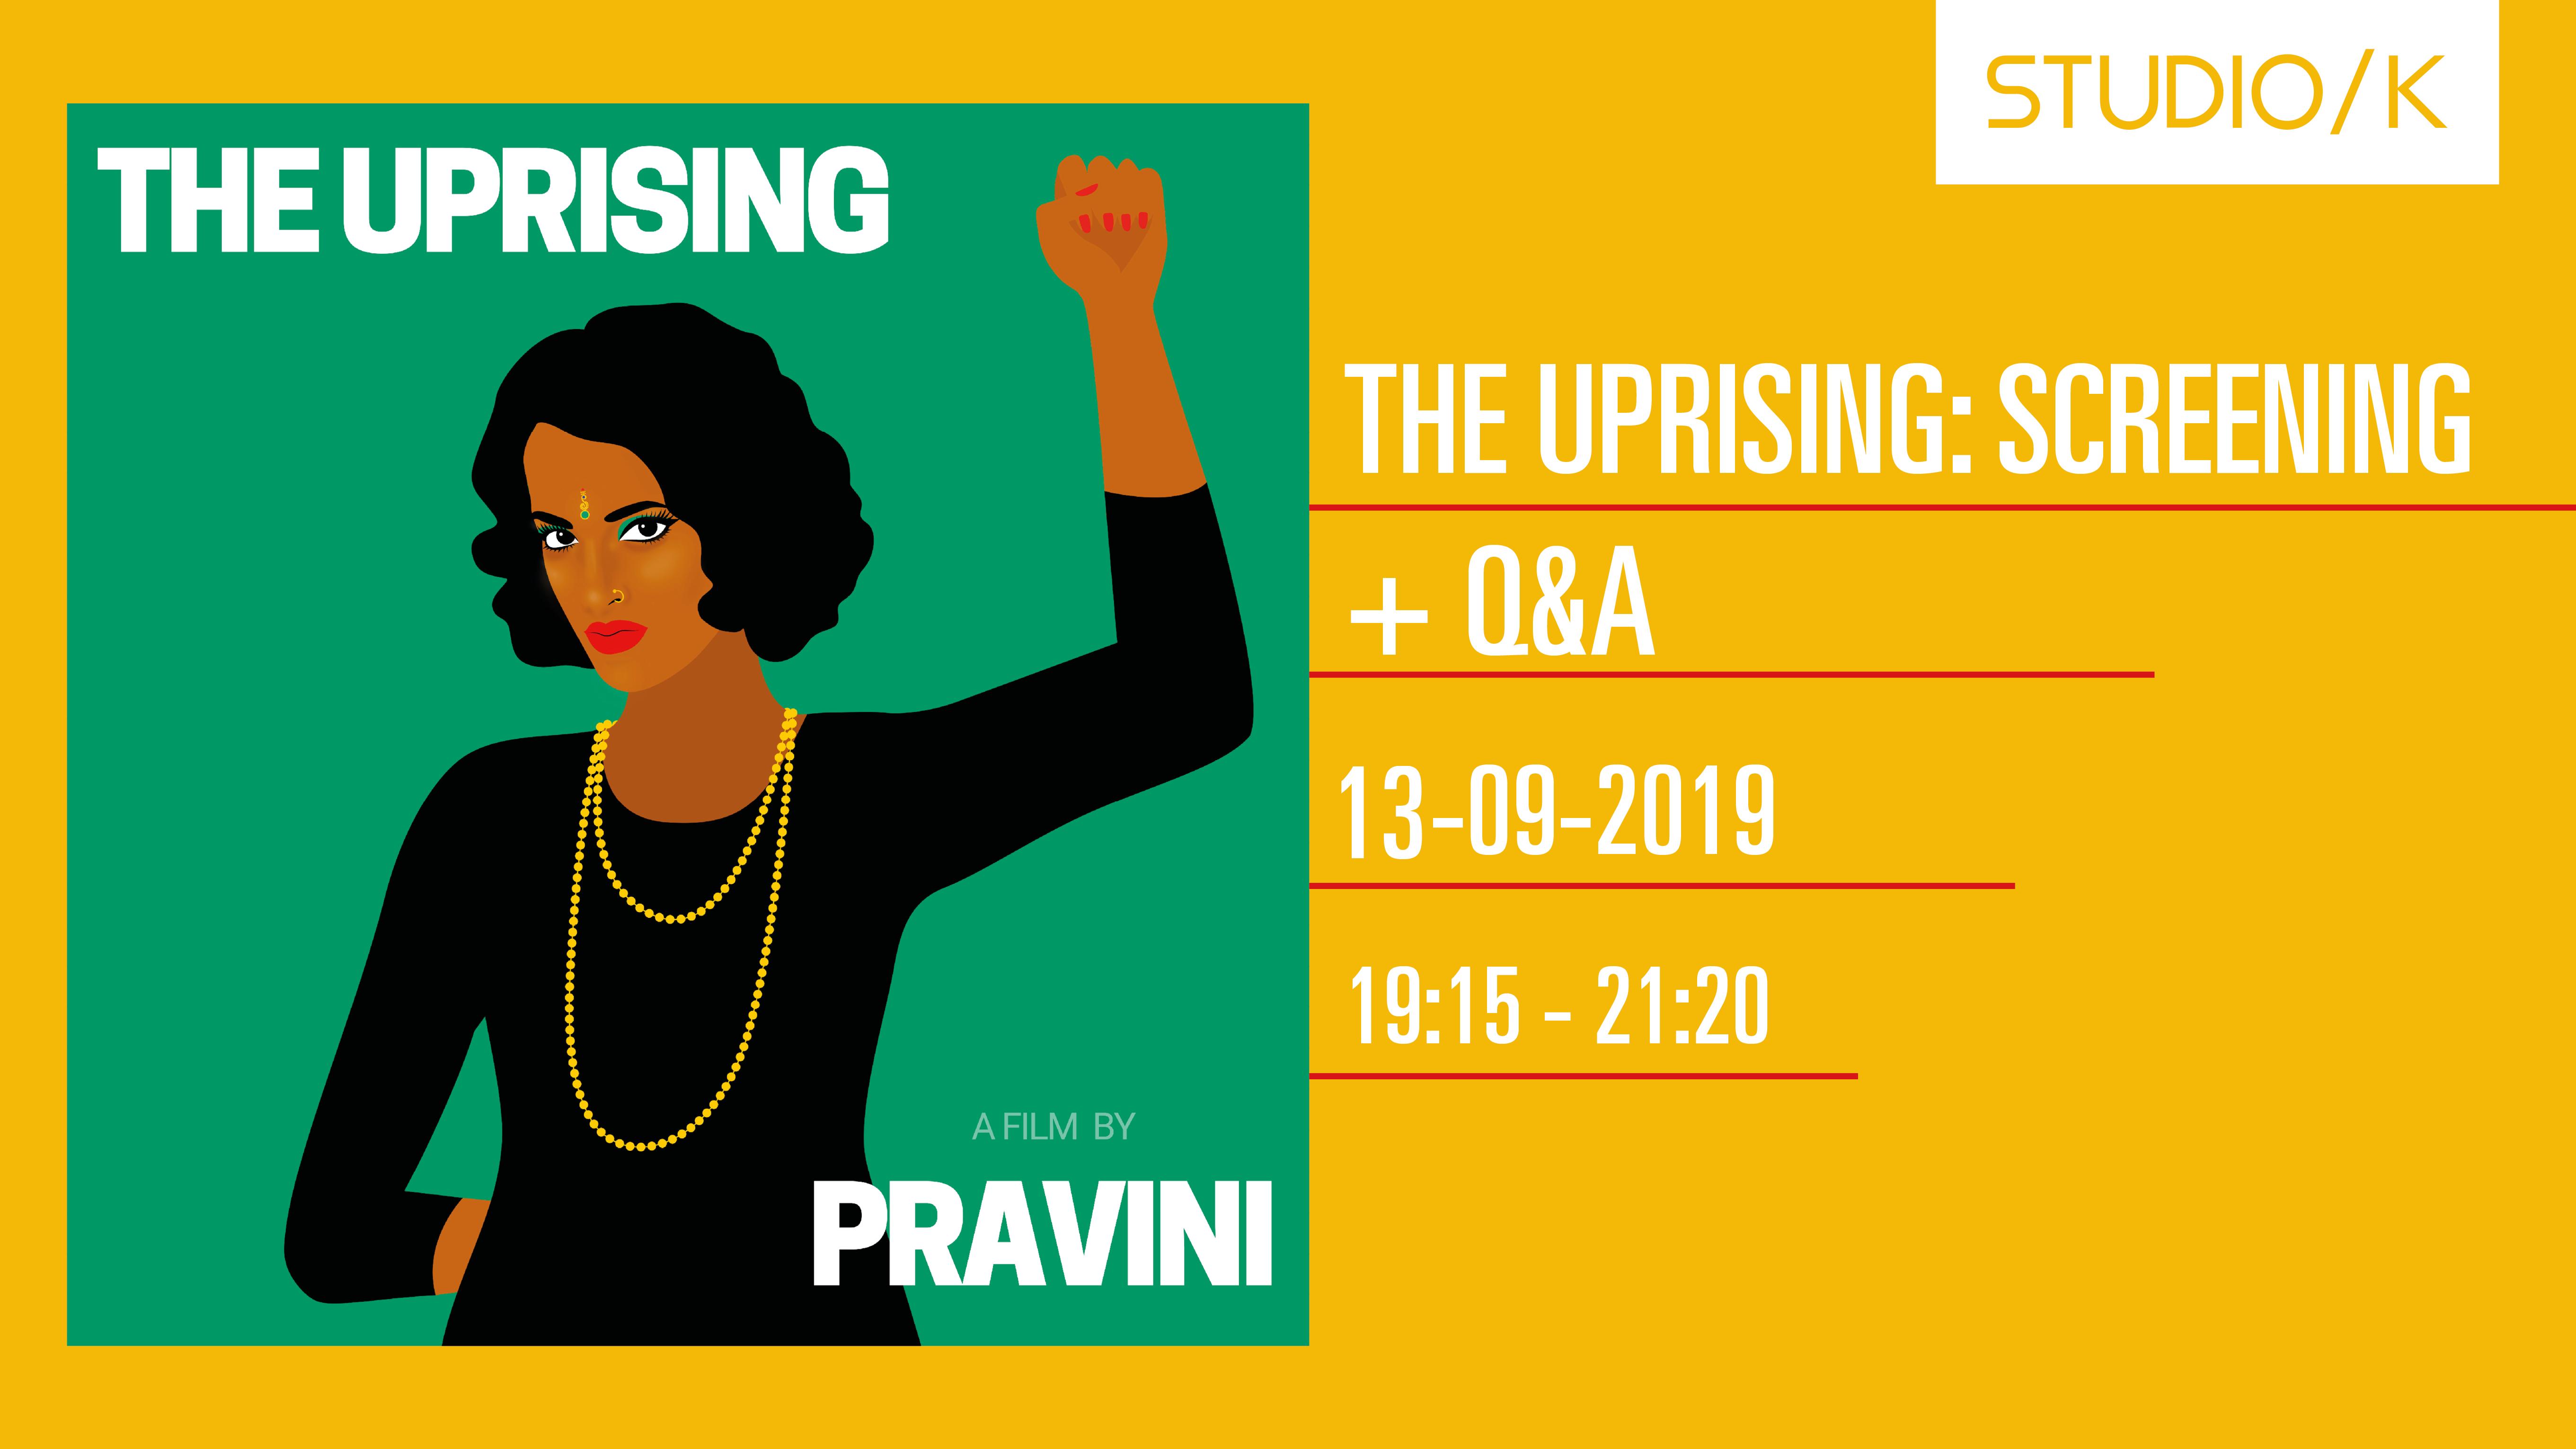 The Uprising: Screening + Q&A